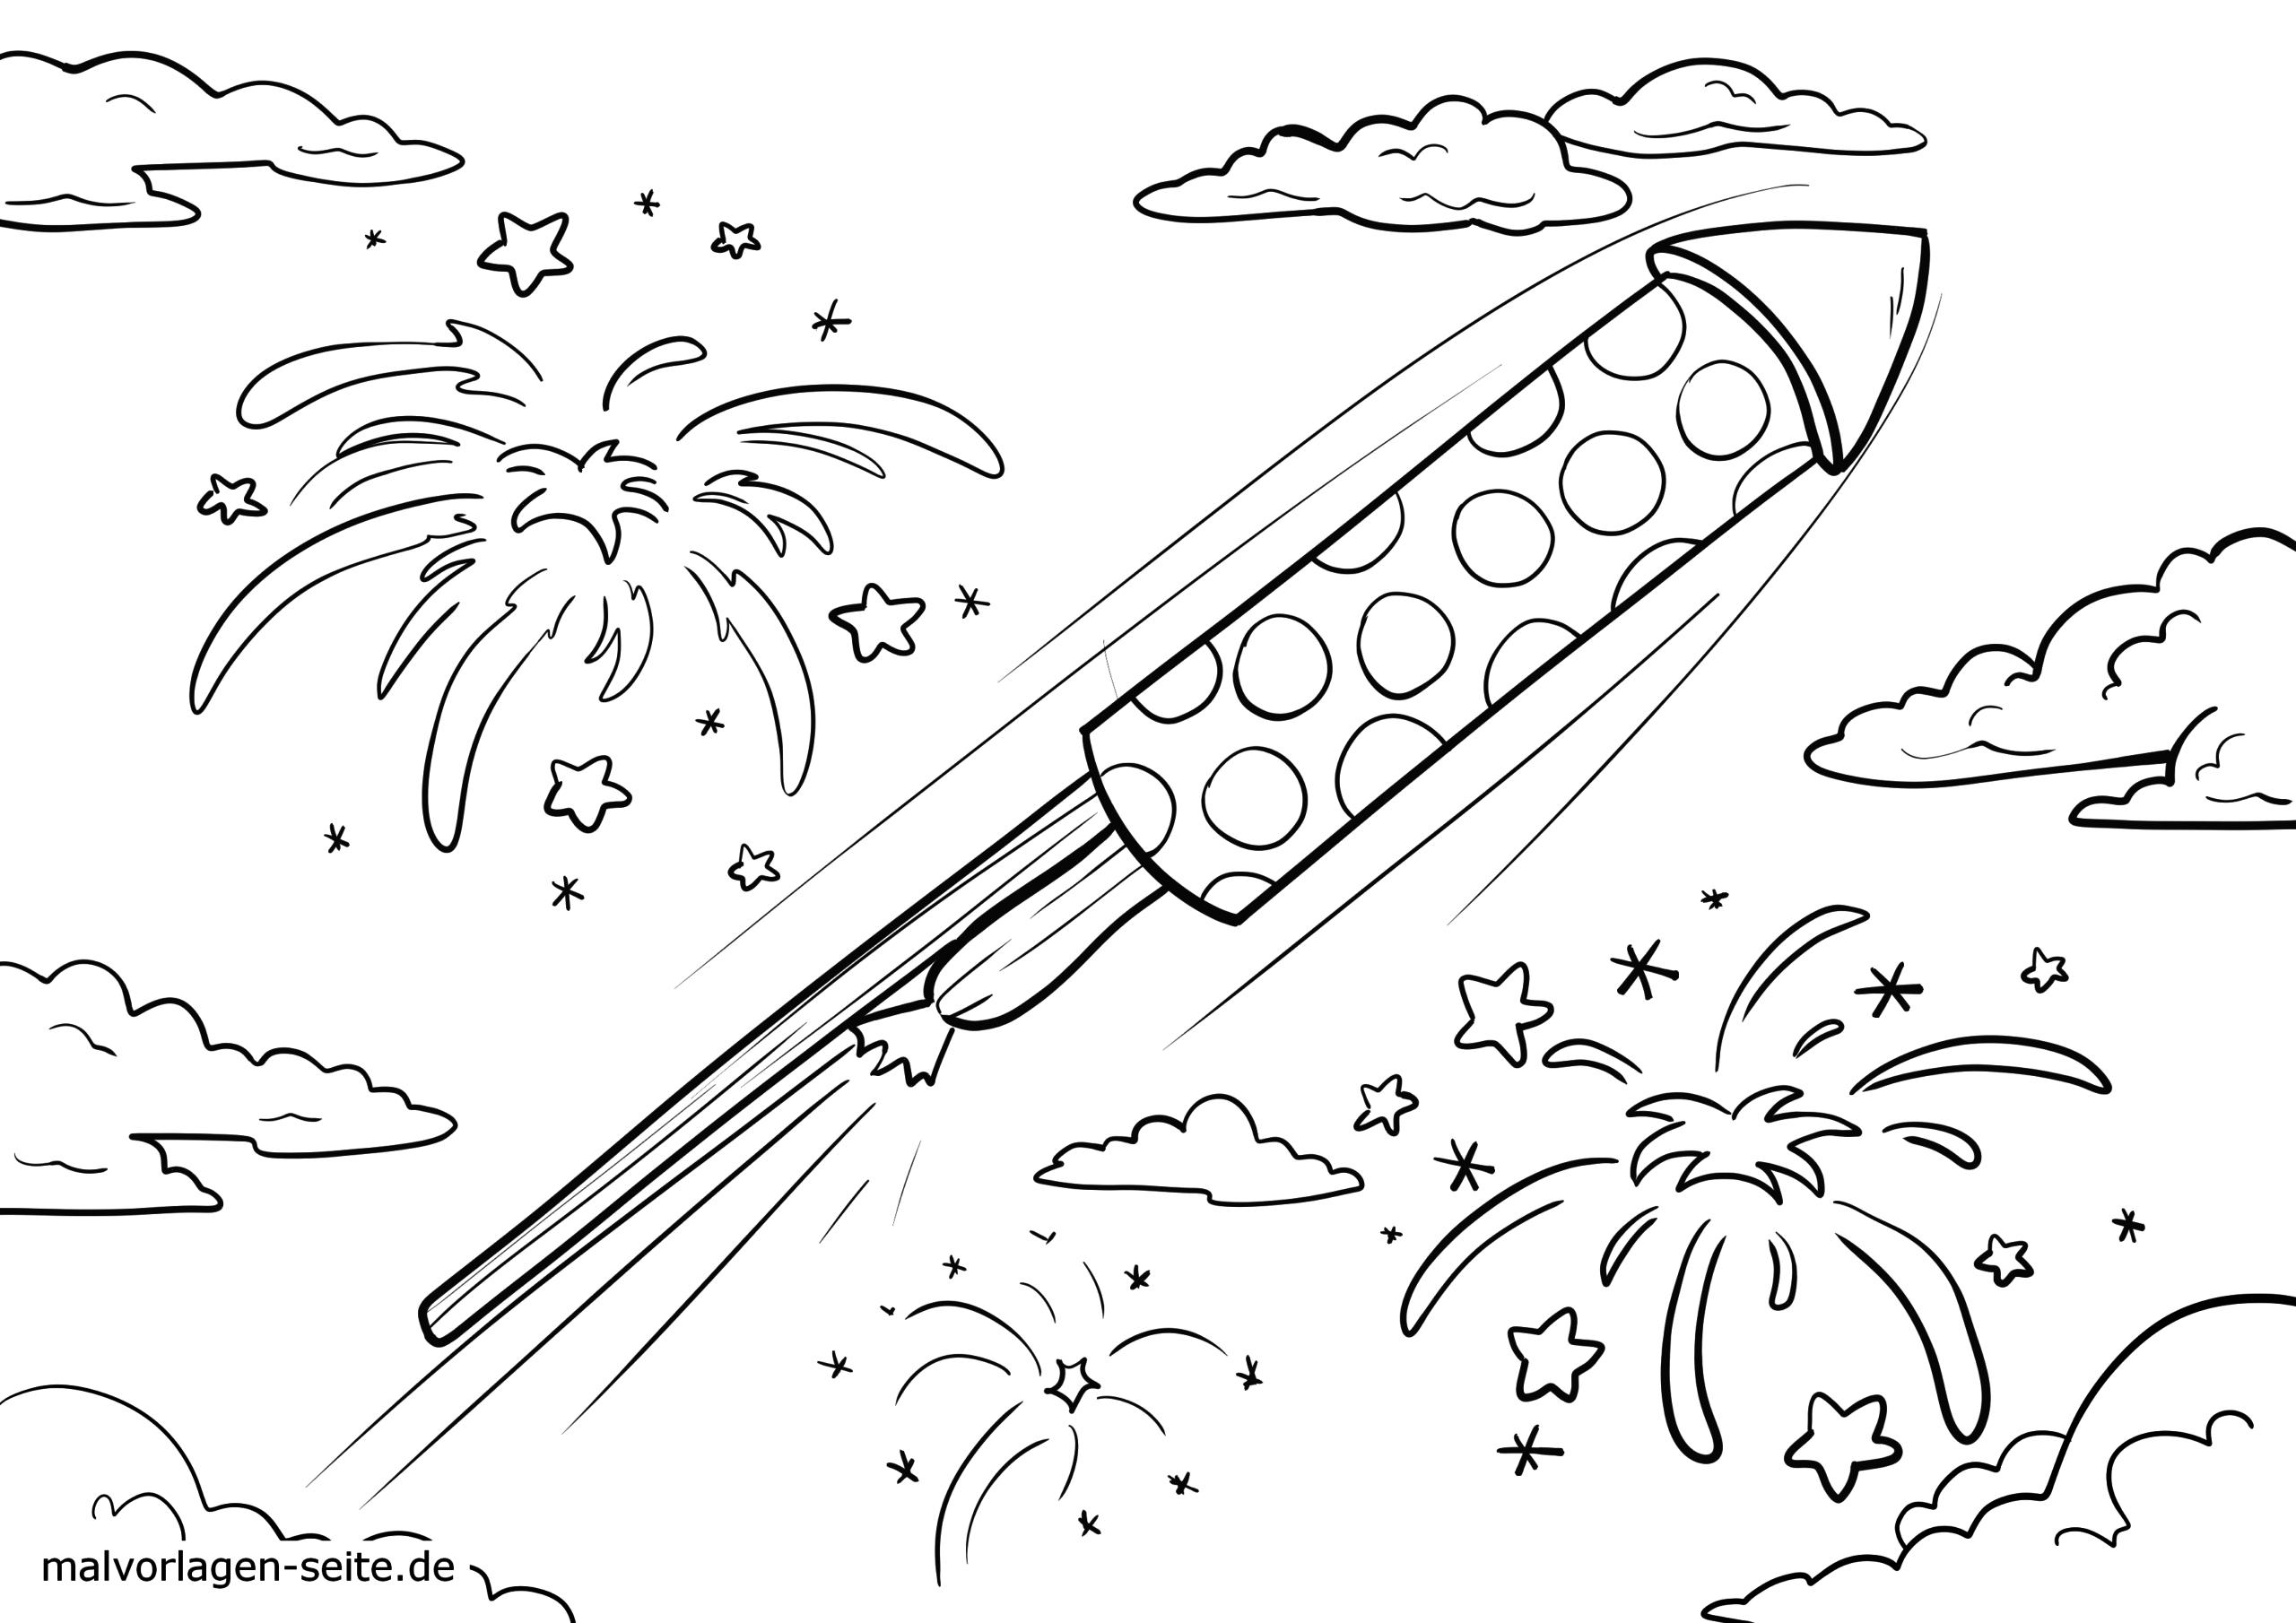 malvorlage silvester rakete  feiertage  ausmalbilder in